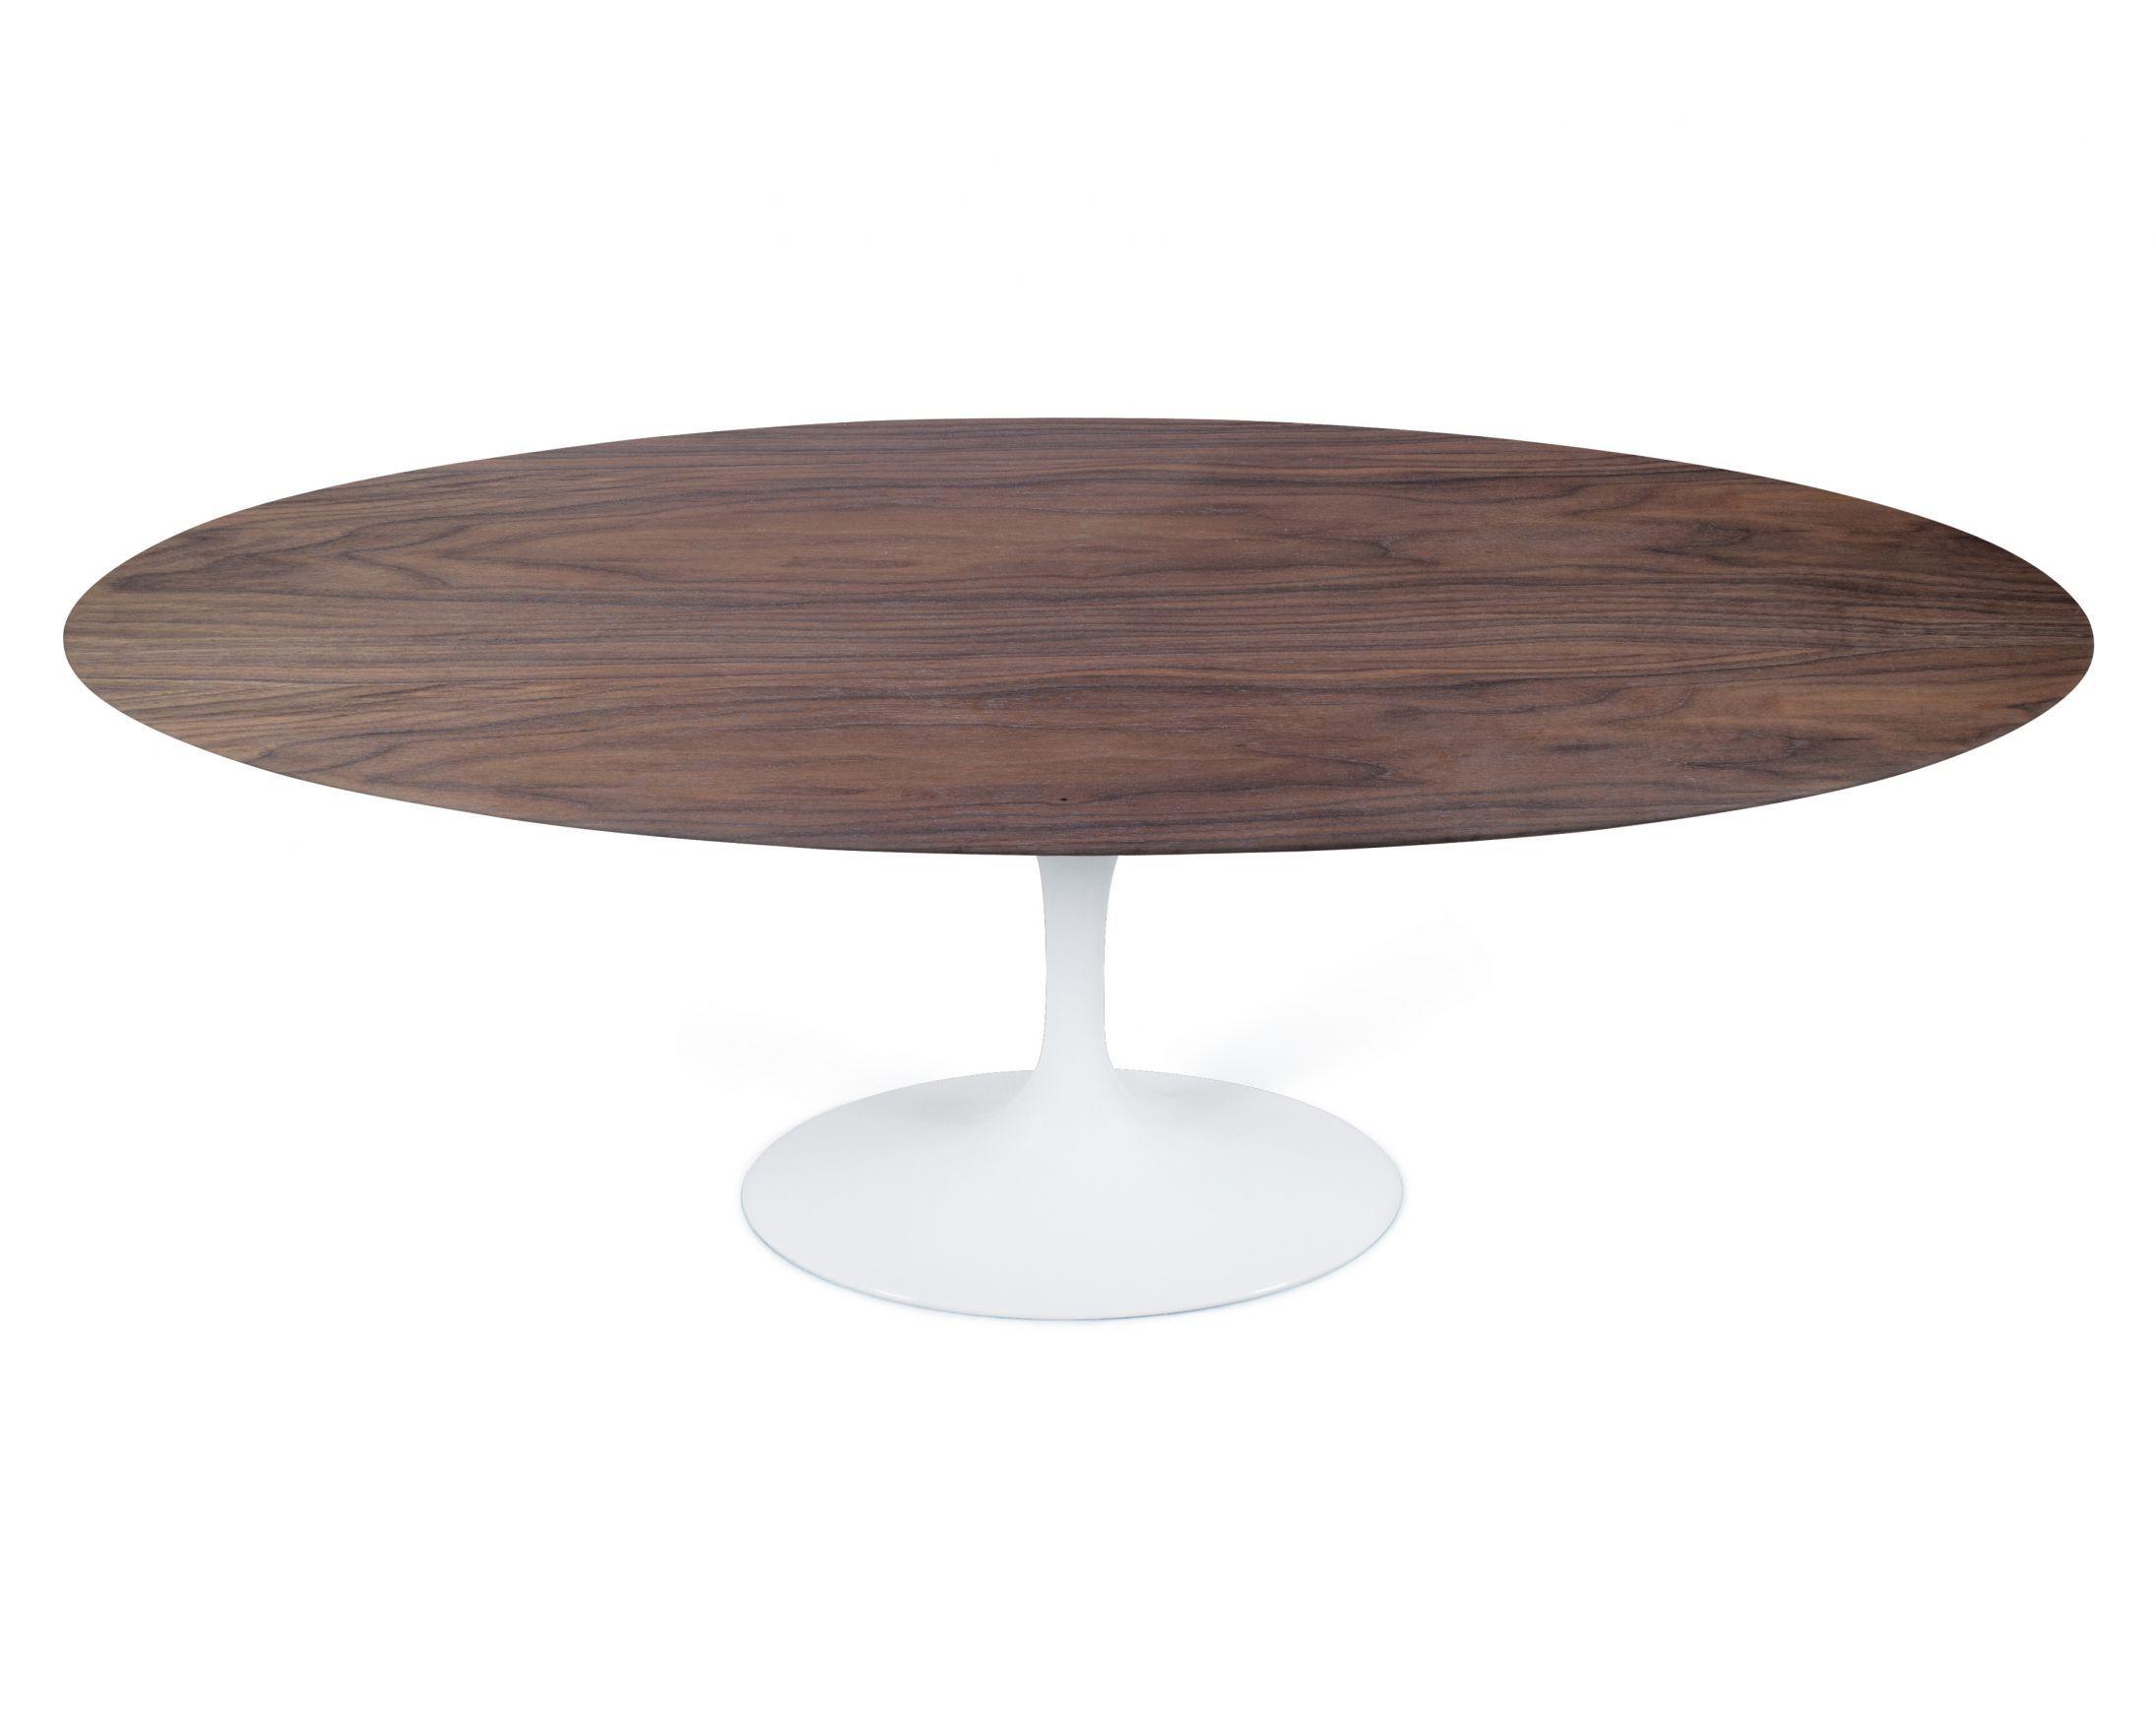 Saarinen Oval Tulip Table Home Design Ideas - Rove concepts saarinen table